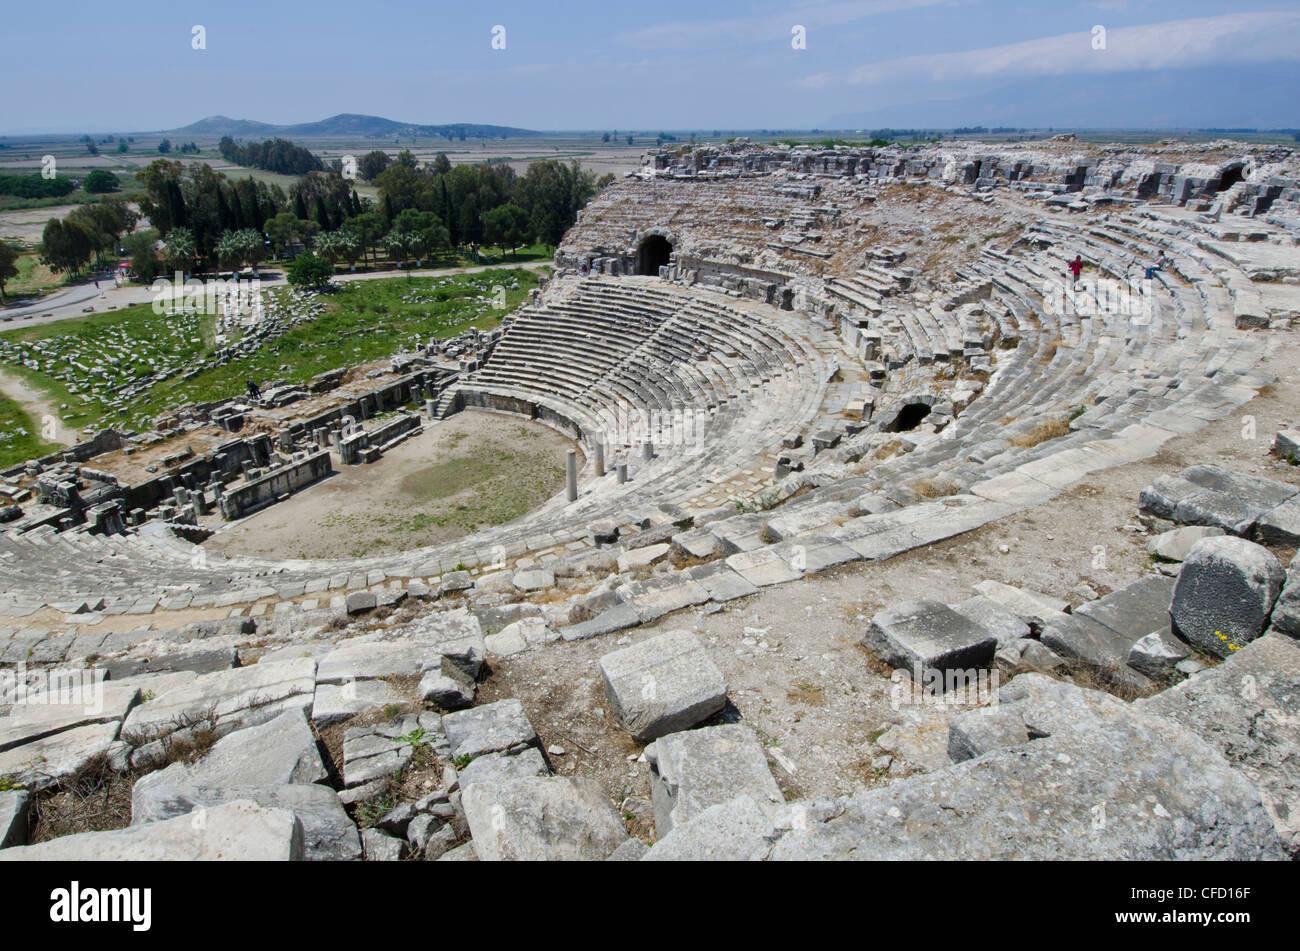 Amphitheatre at Miletus, an ancient Greek city on the western coast of Anatolia, Turkey - Stock Image